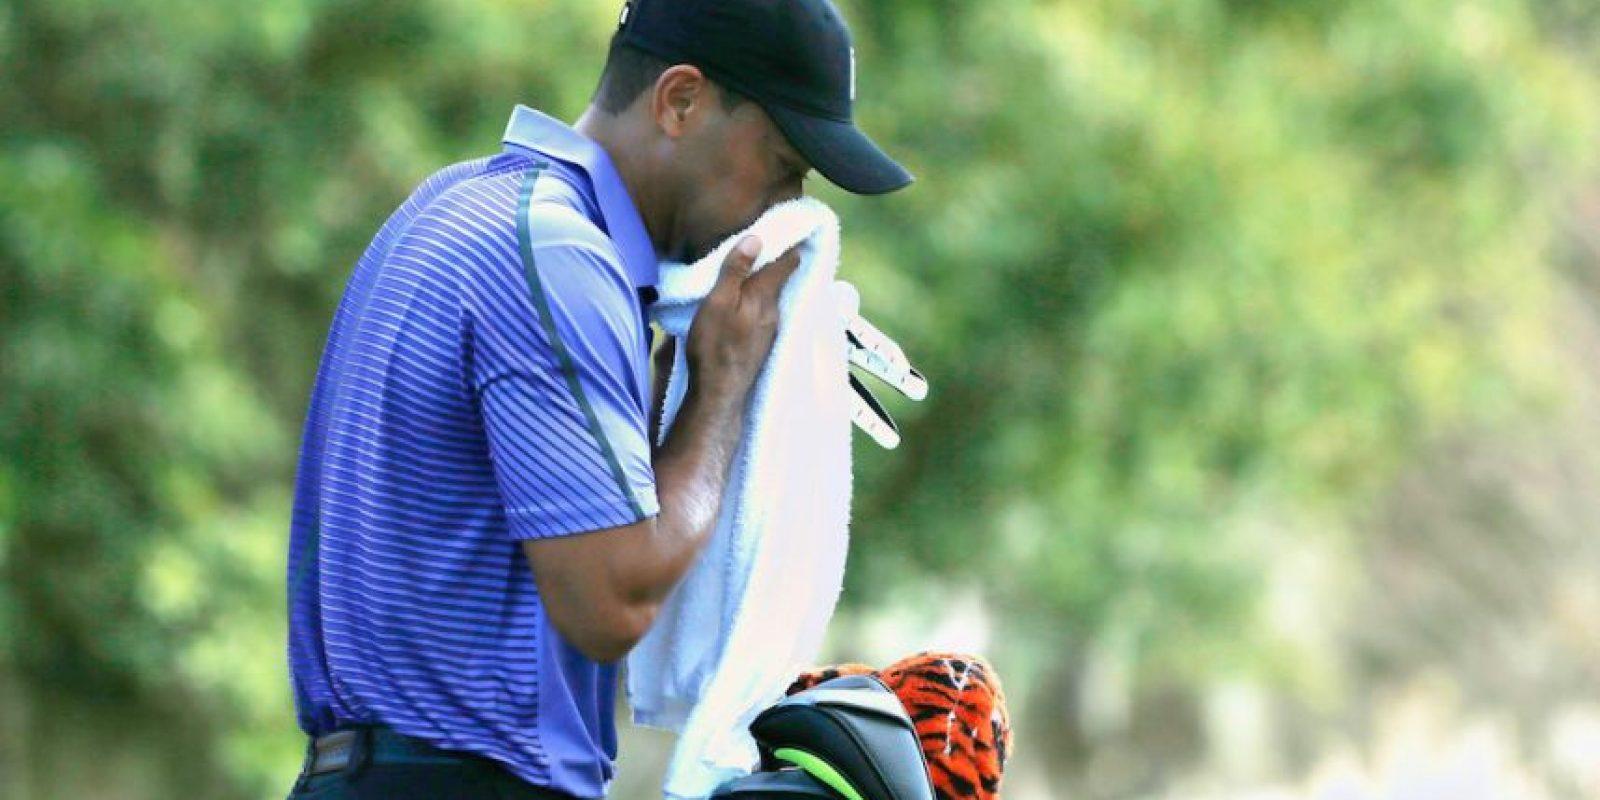 Woods vomitó en el torneo Hero World Challenge debido a laringitis. Foto:Getty Images